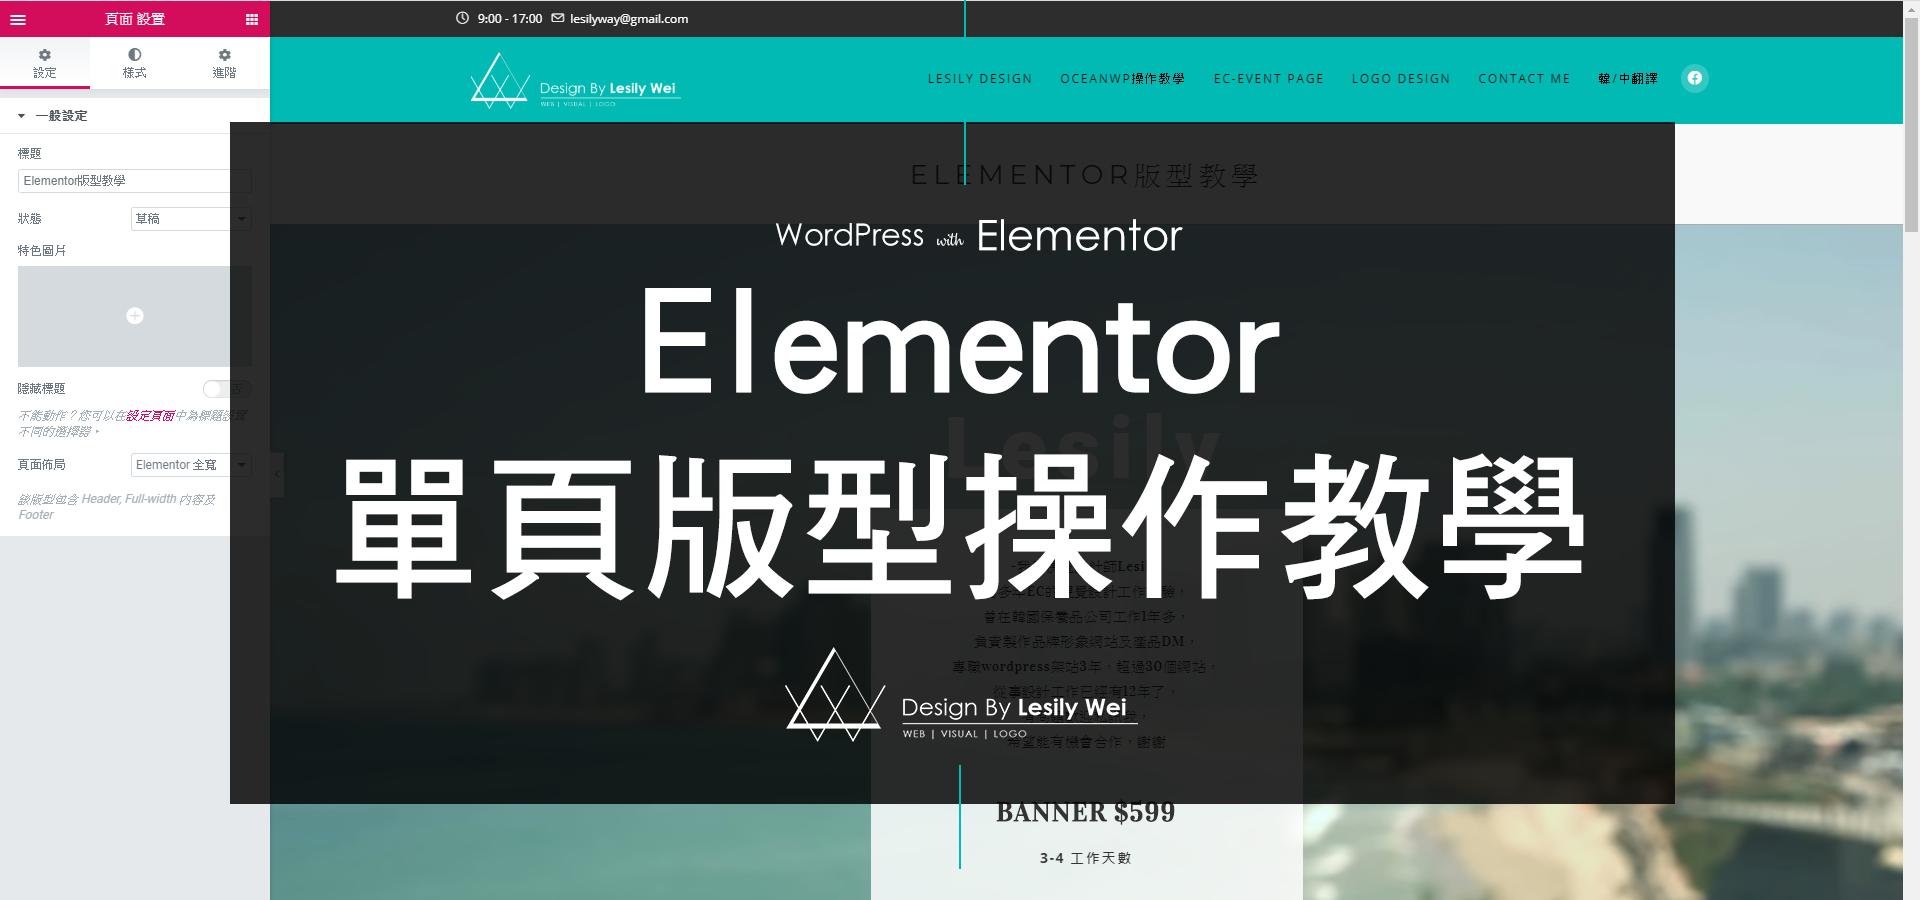 Read more about the article WordPress新手必學 | 設計師愛用網頁特效!如何用Elementor單頁版型做漂亮的動態網頁 操作圖解